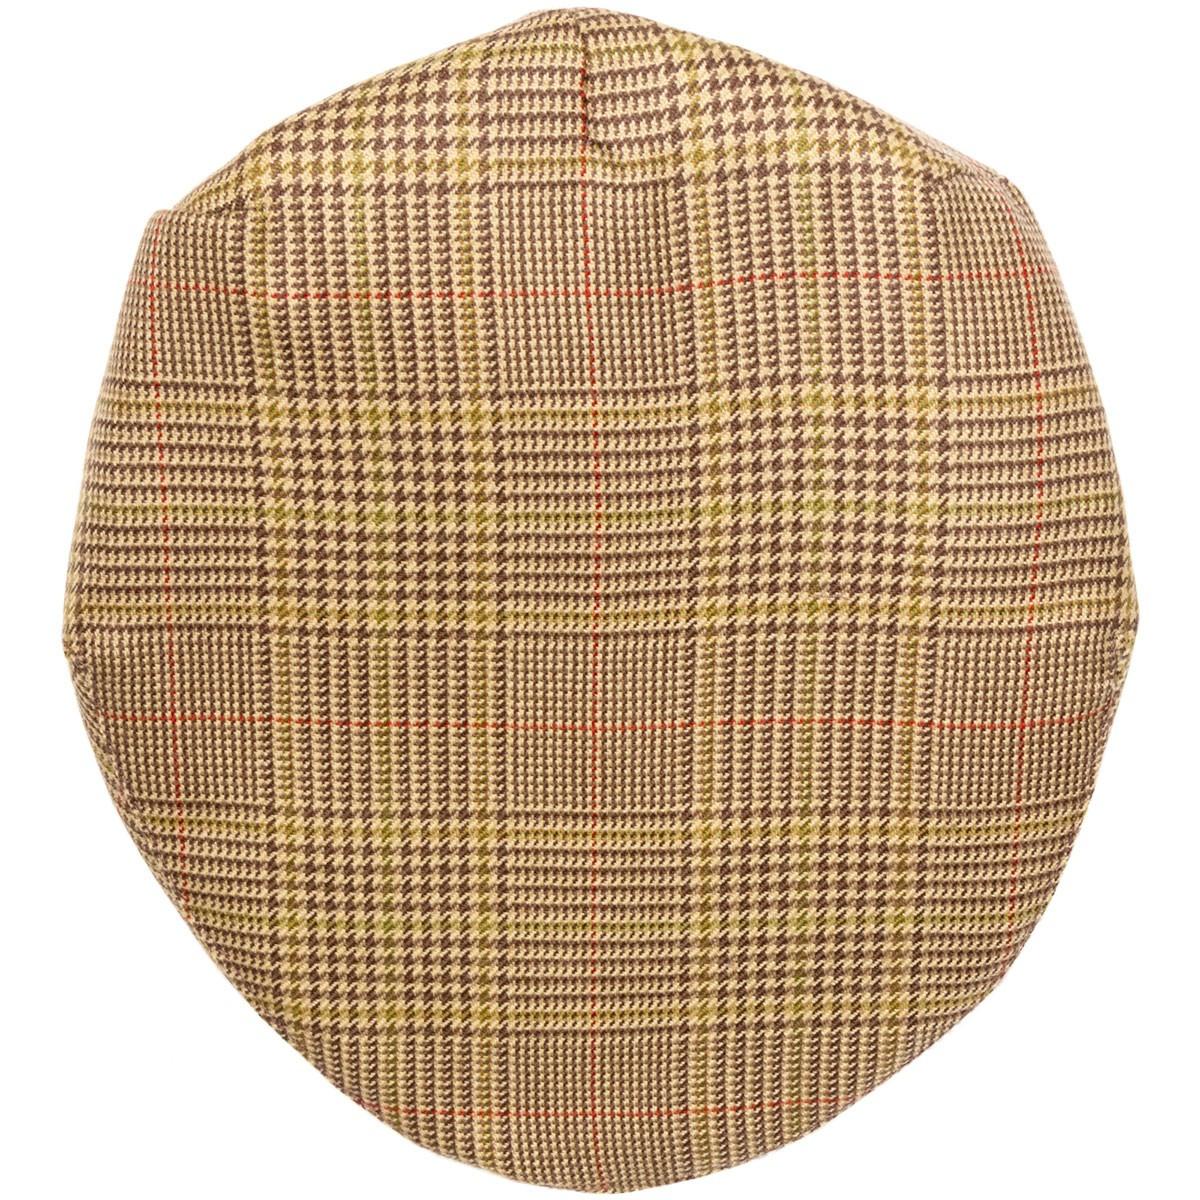 74e1aae5b57ac CRAIL CHECK TWEED BARNTON FLAT CAP. Price   54.00. Image 1. Larger   More  Photos